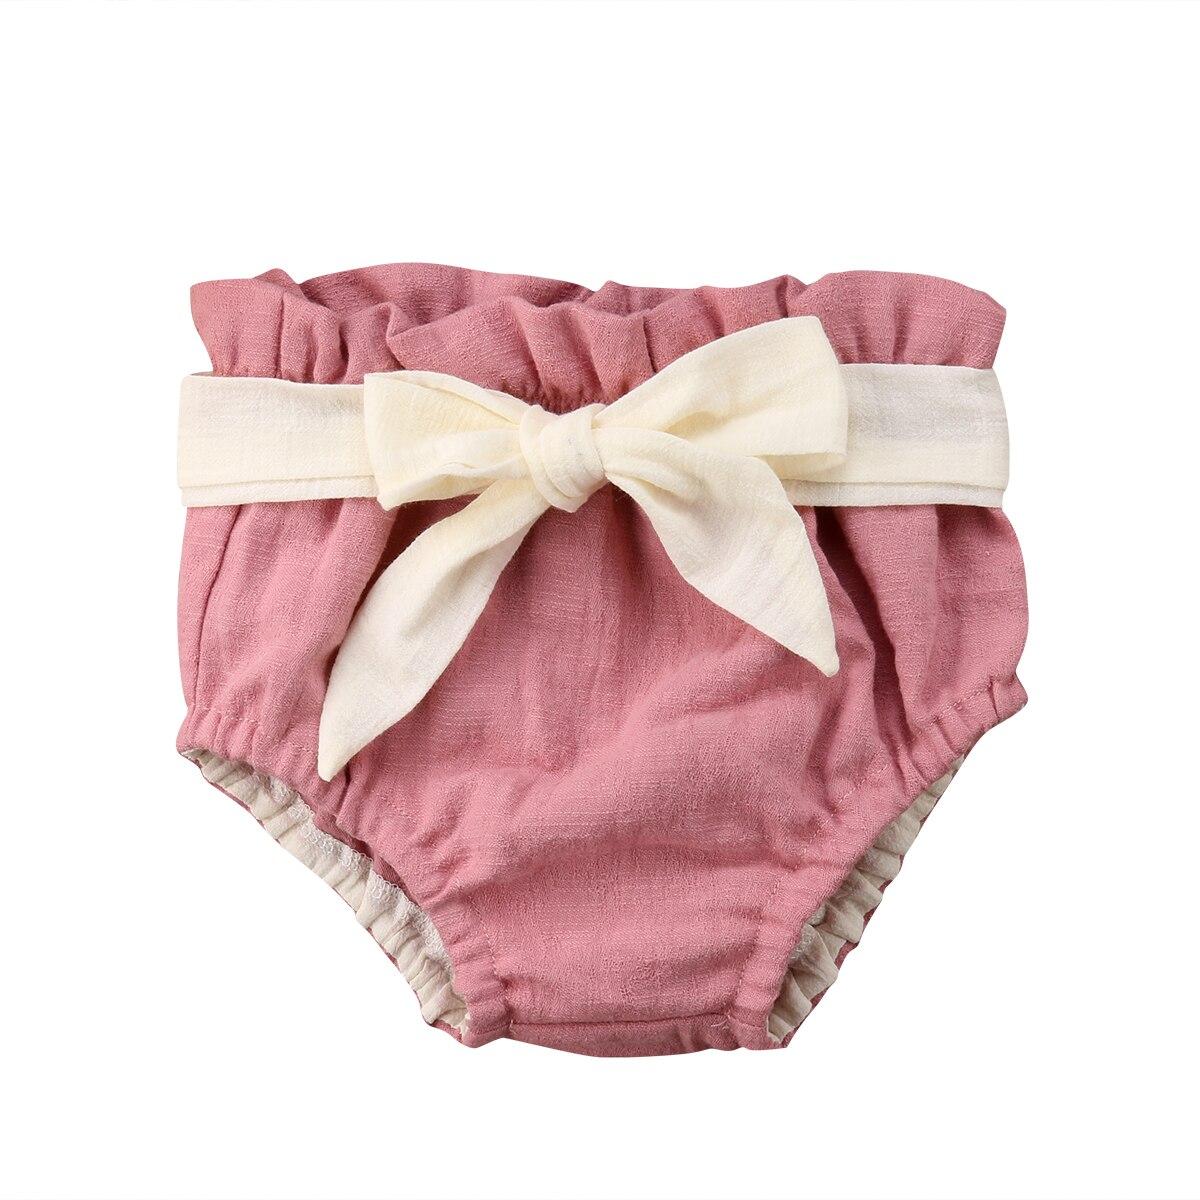 Bowknot Baby Mädchen Rüsche Pumphose Shorts